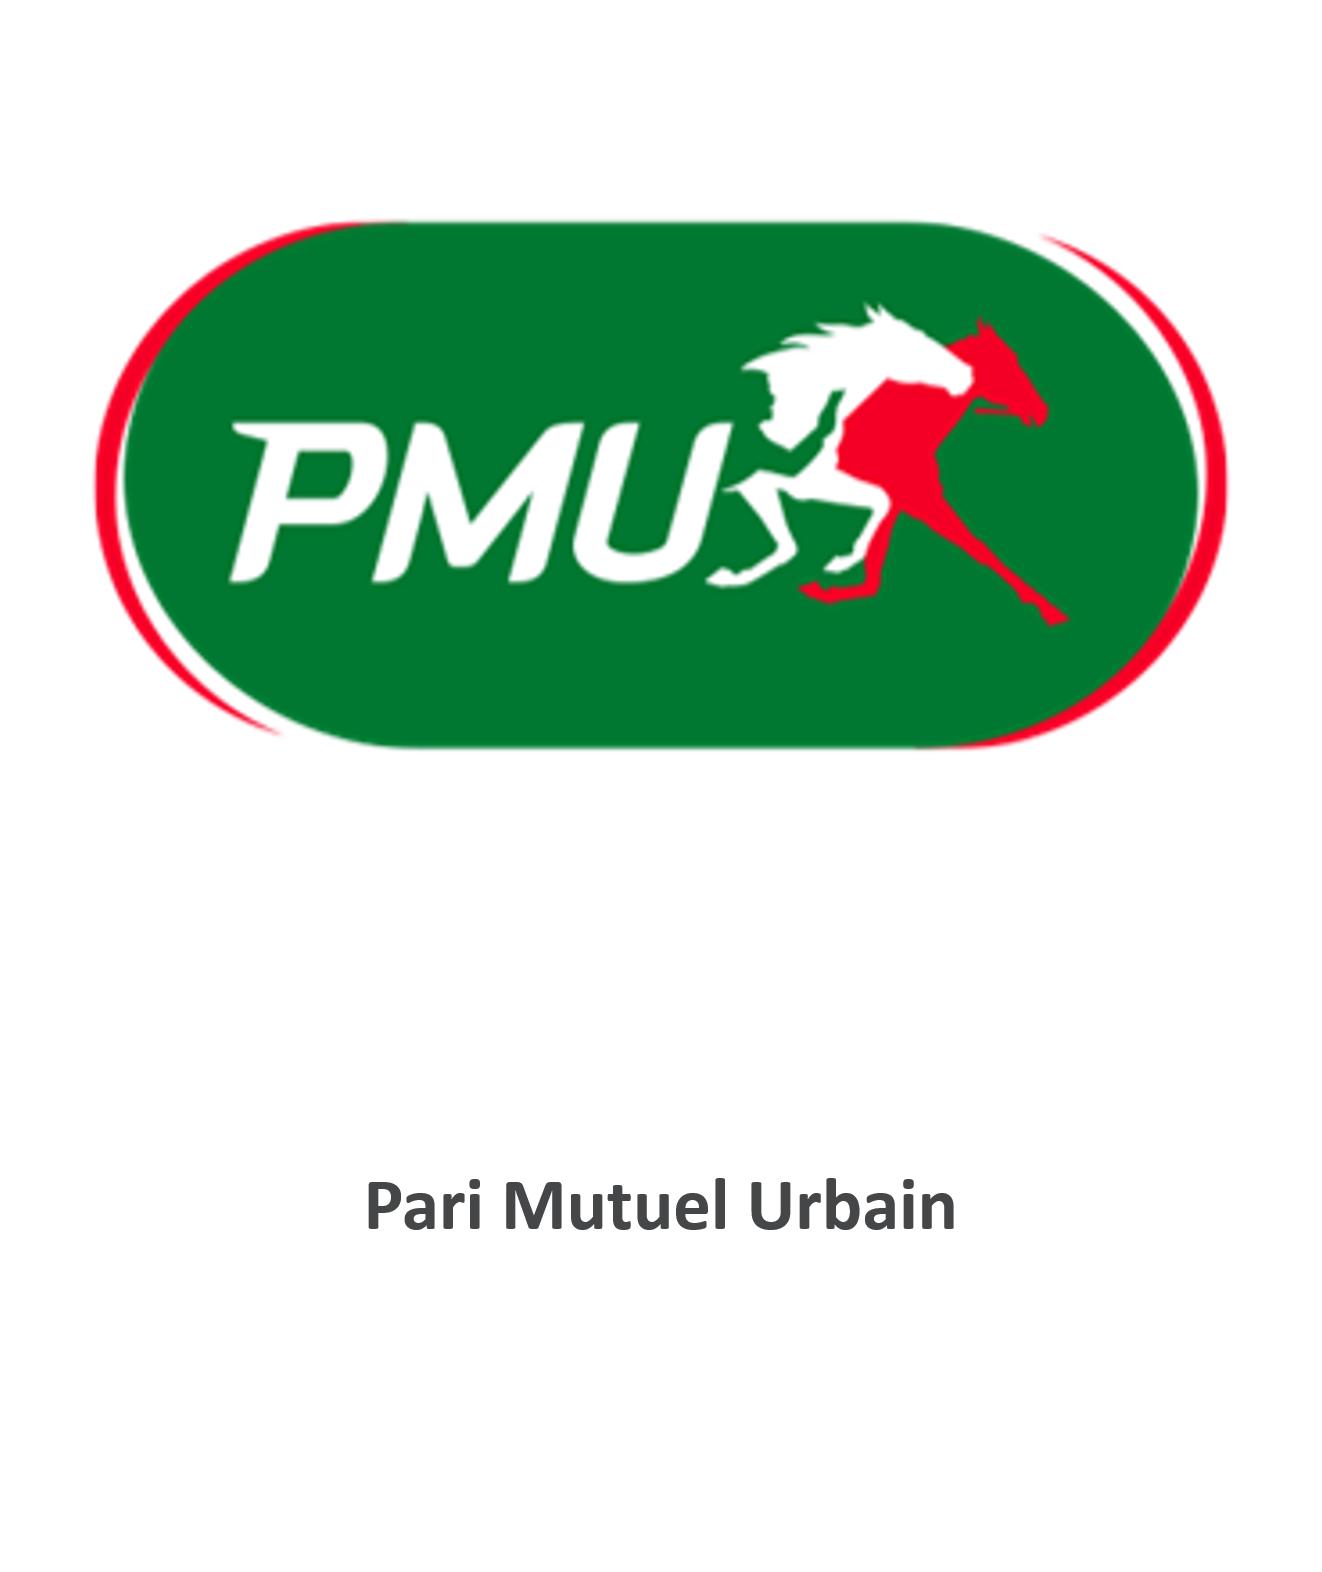 https://mclloyd.com/wp-content/uploads/2021/05/PMU-1.png